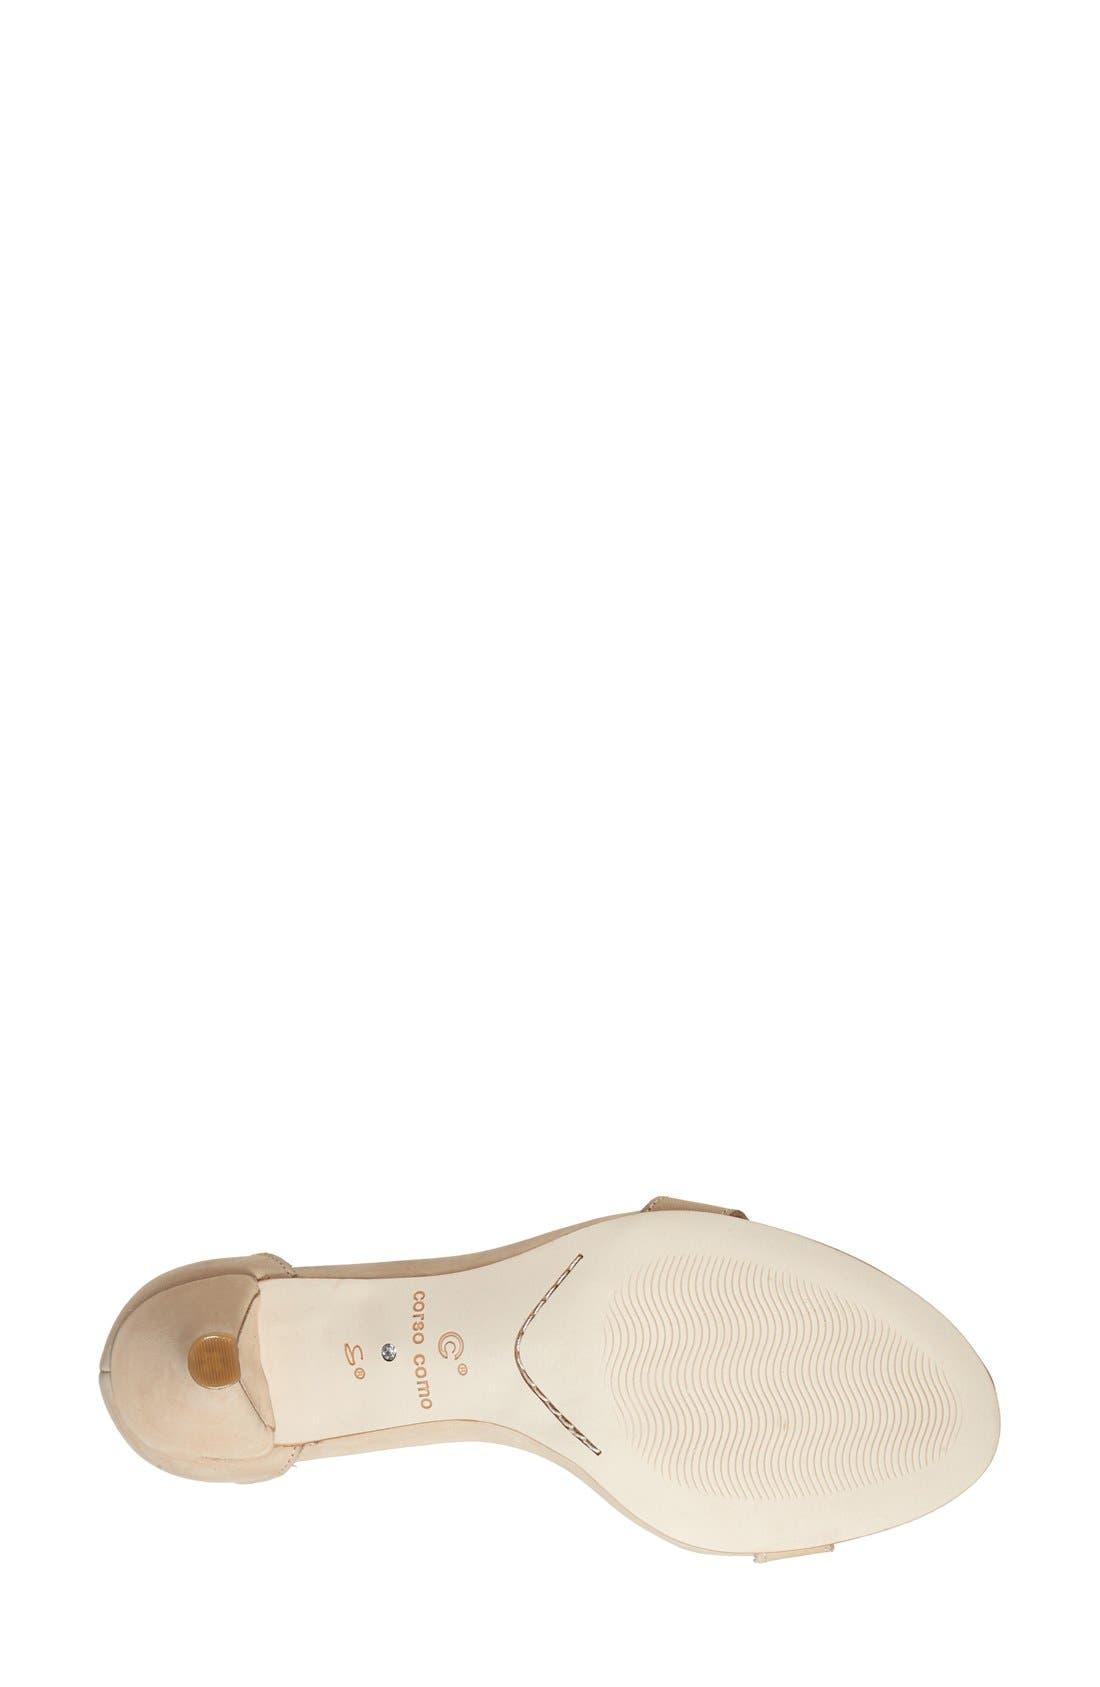 CC Corso Como 'Caitlyn' Sandal,                             Alternate thumbnail 4, color,                             251